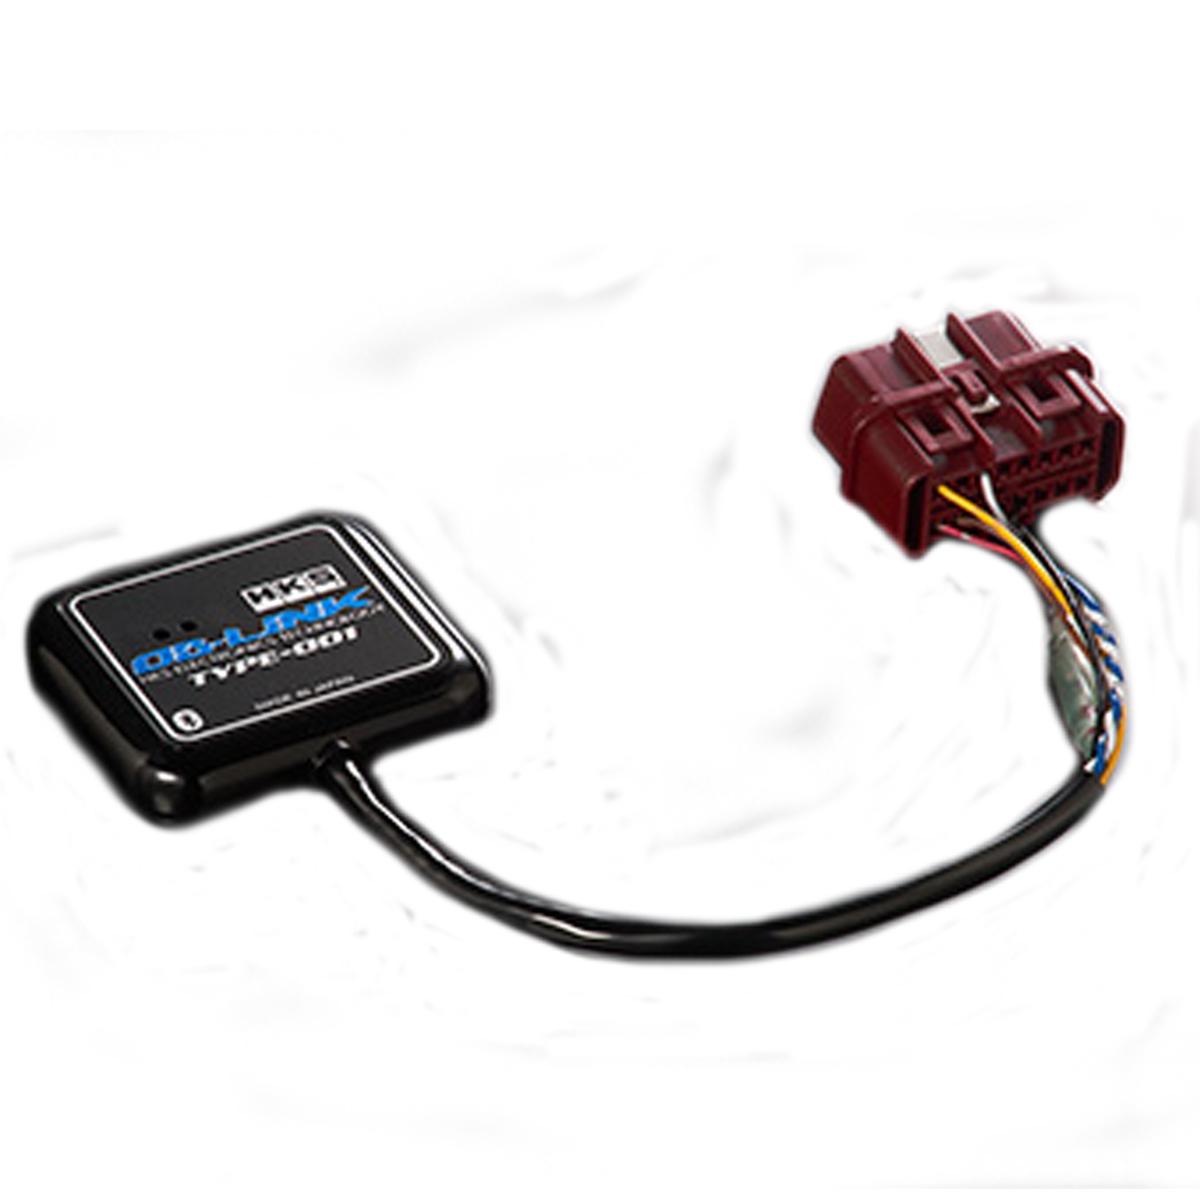 CX-7 モニター OBリンク タイプ 001 ER3P HKS 44009-AK002 エレクトリニクス 個人宅発送追金有